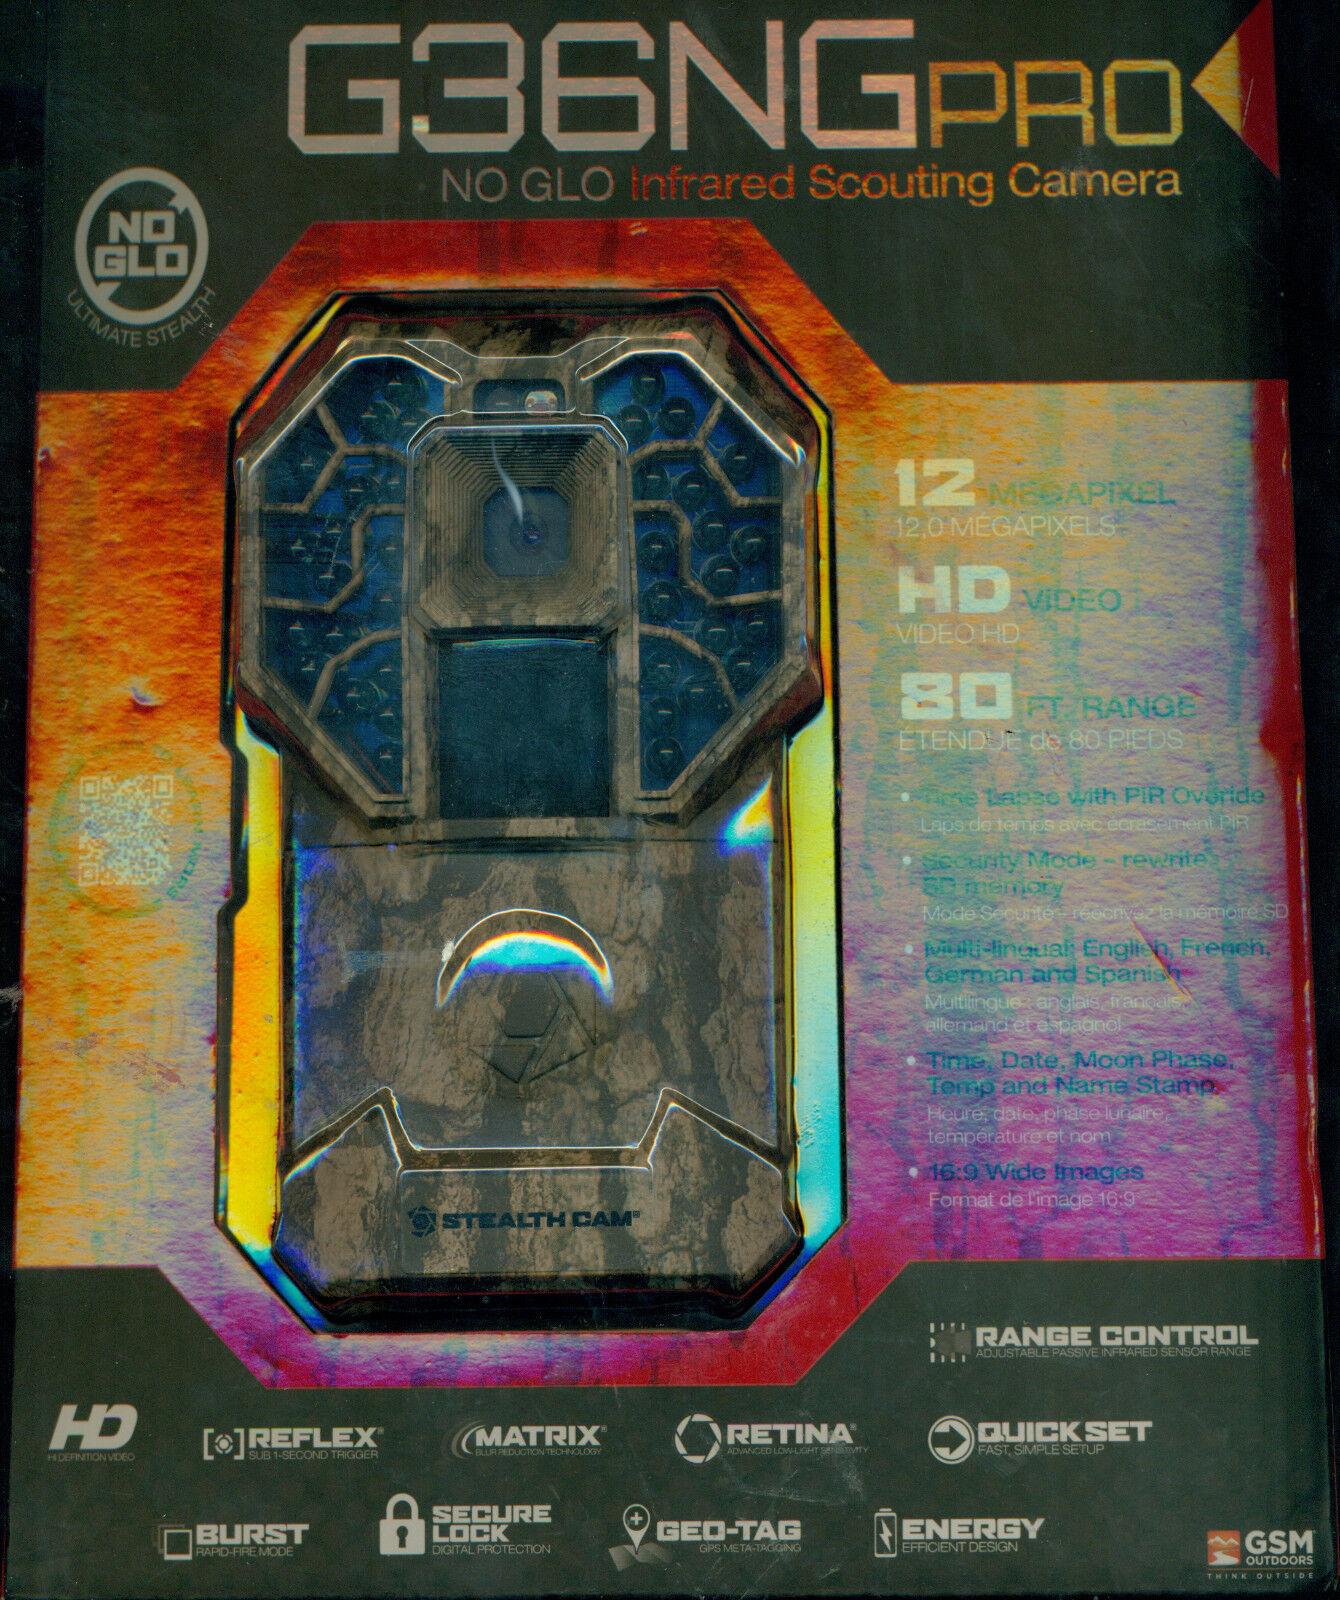 STEALTH CAM G36 No Glo Digital Trail Game Camera (12MP) 80ft Range STC-G36NG